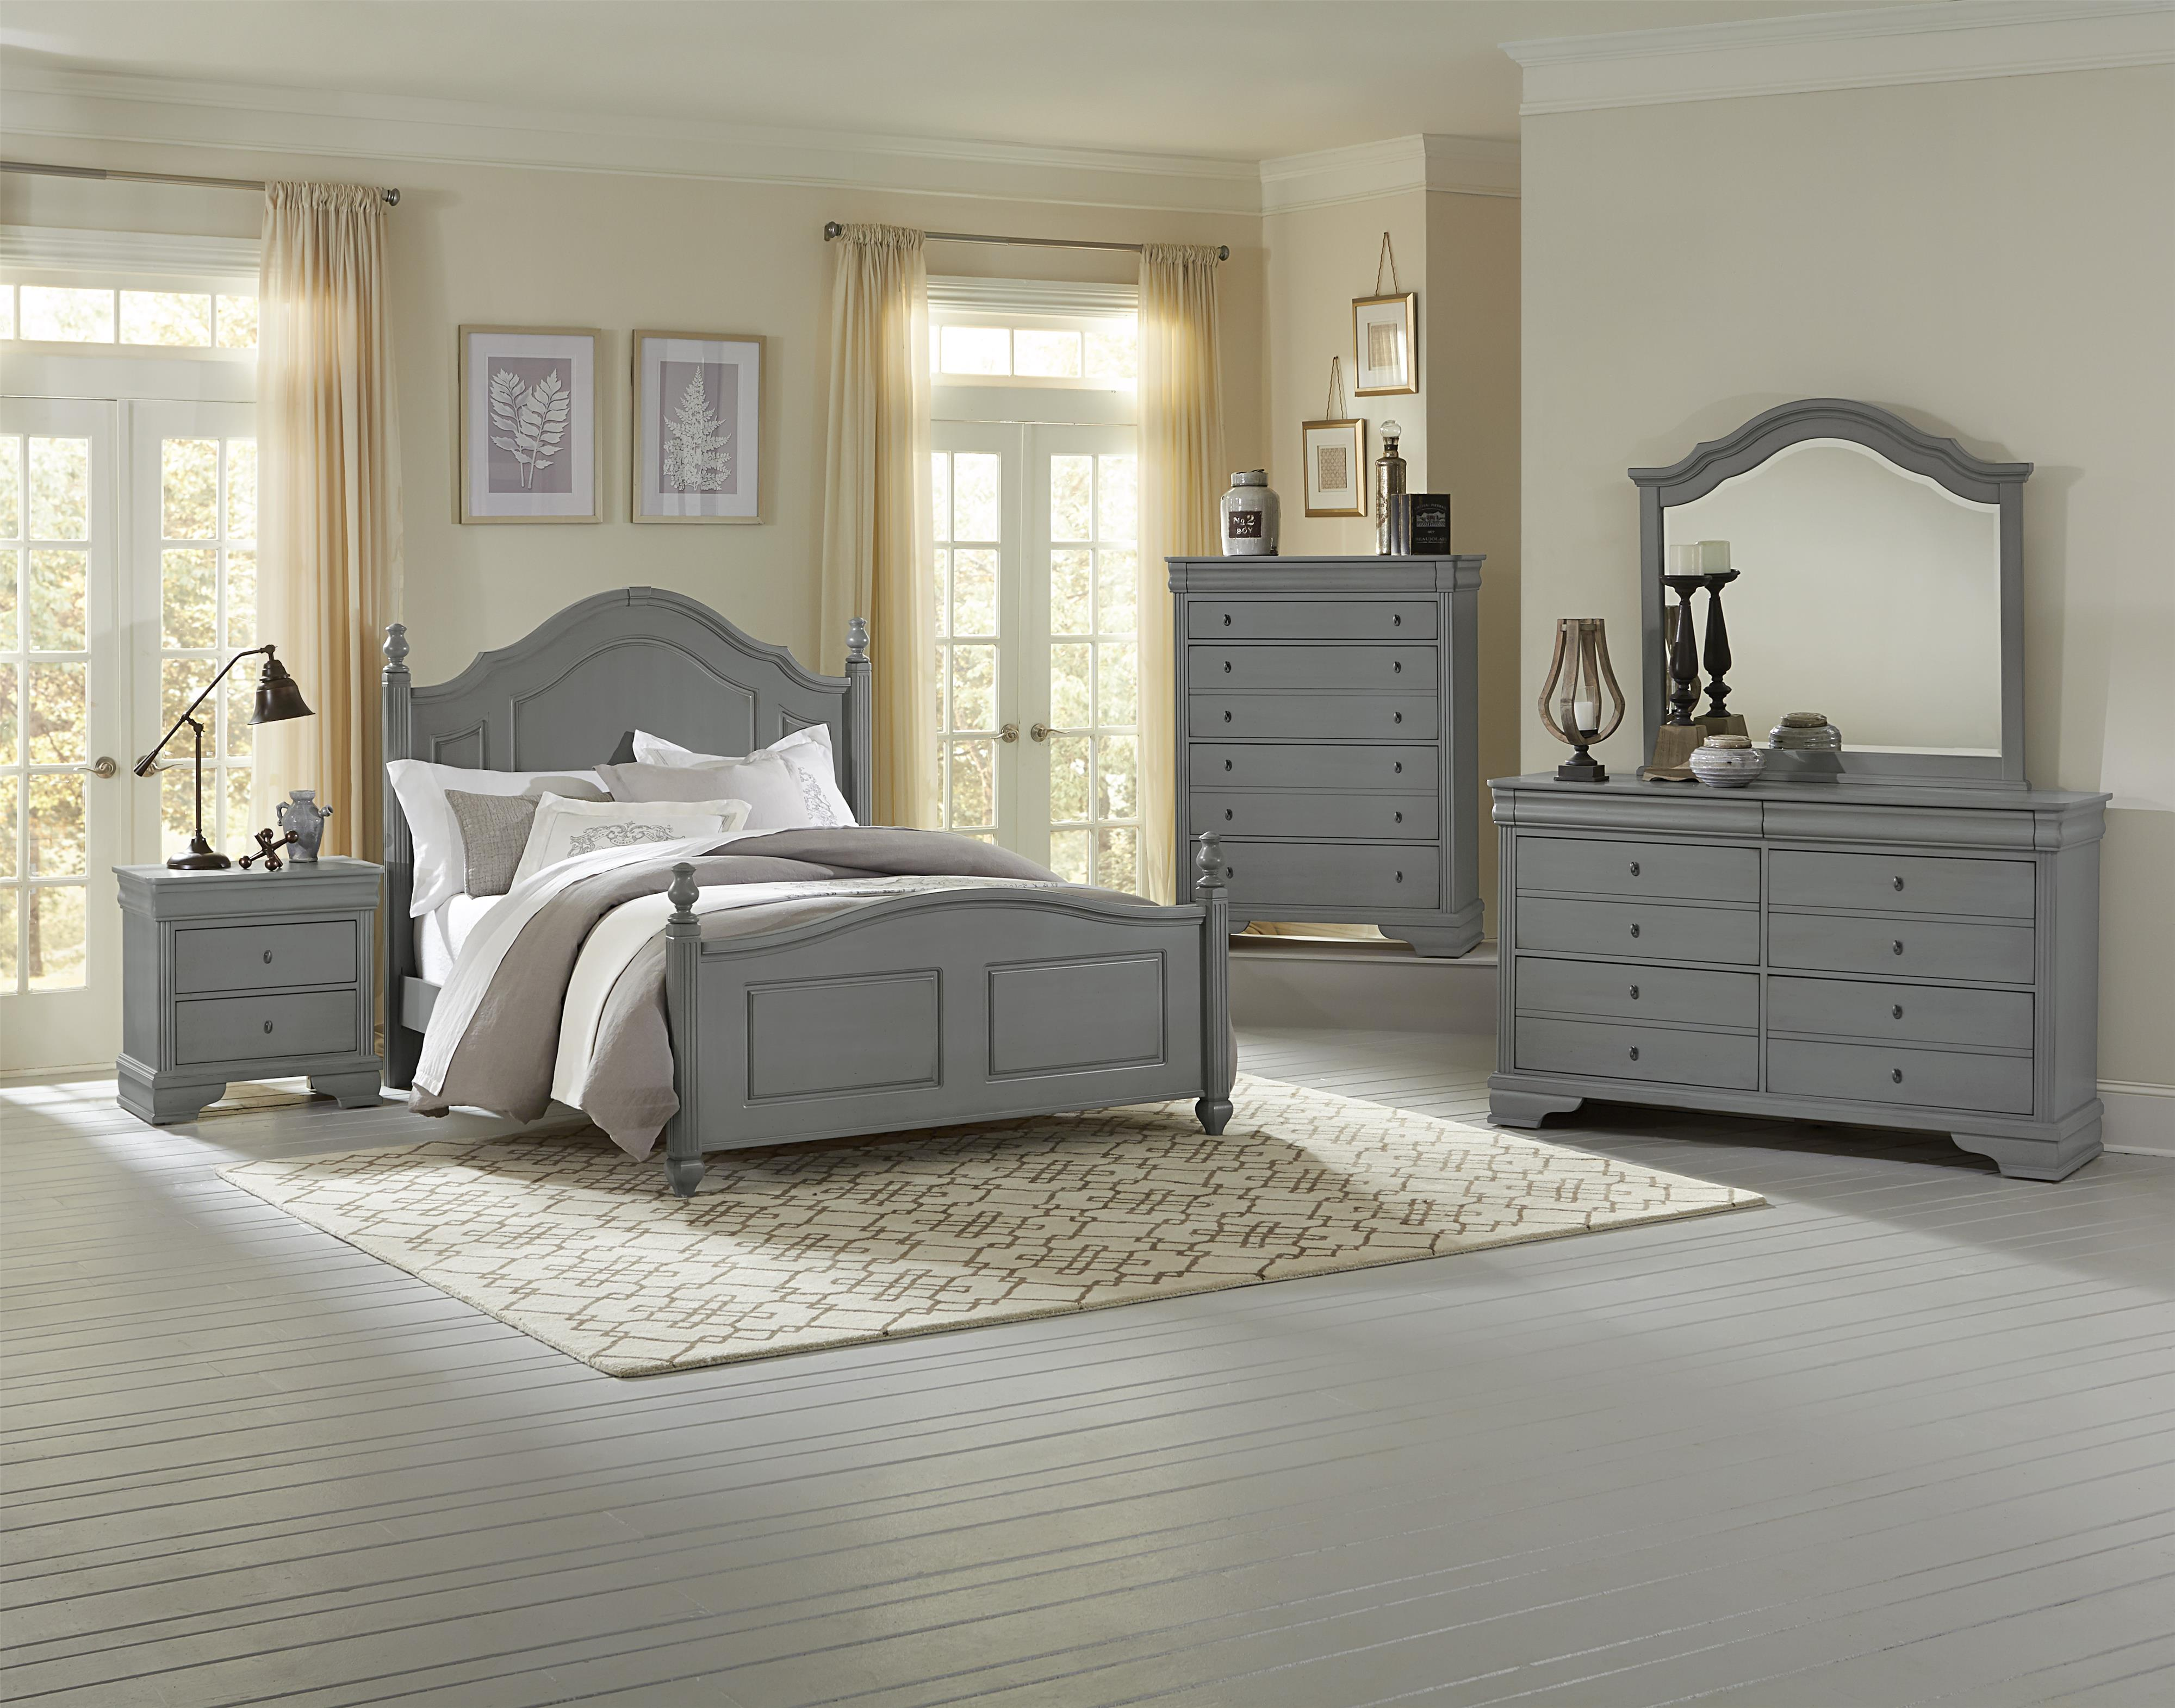 vaughan bassett french market queen bedroom group belfort furniture bedroom groups. Black Bedroom Furniture Sets. Home Design Ideas